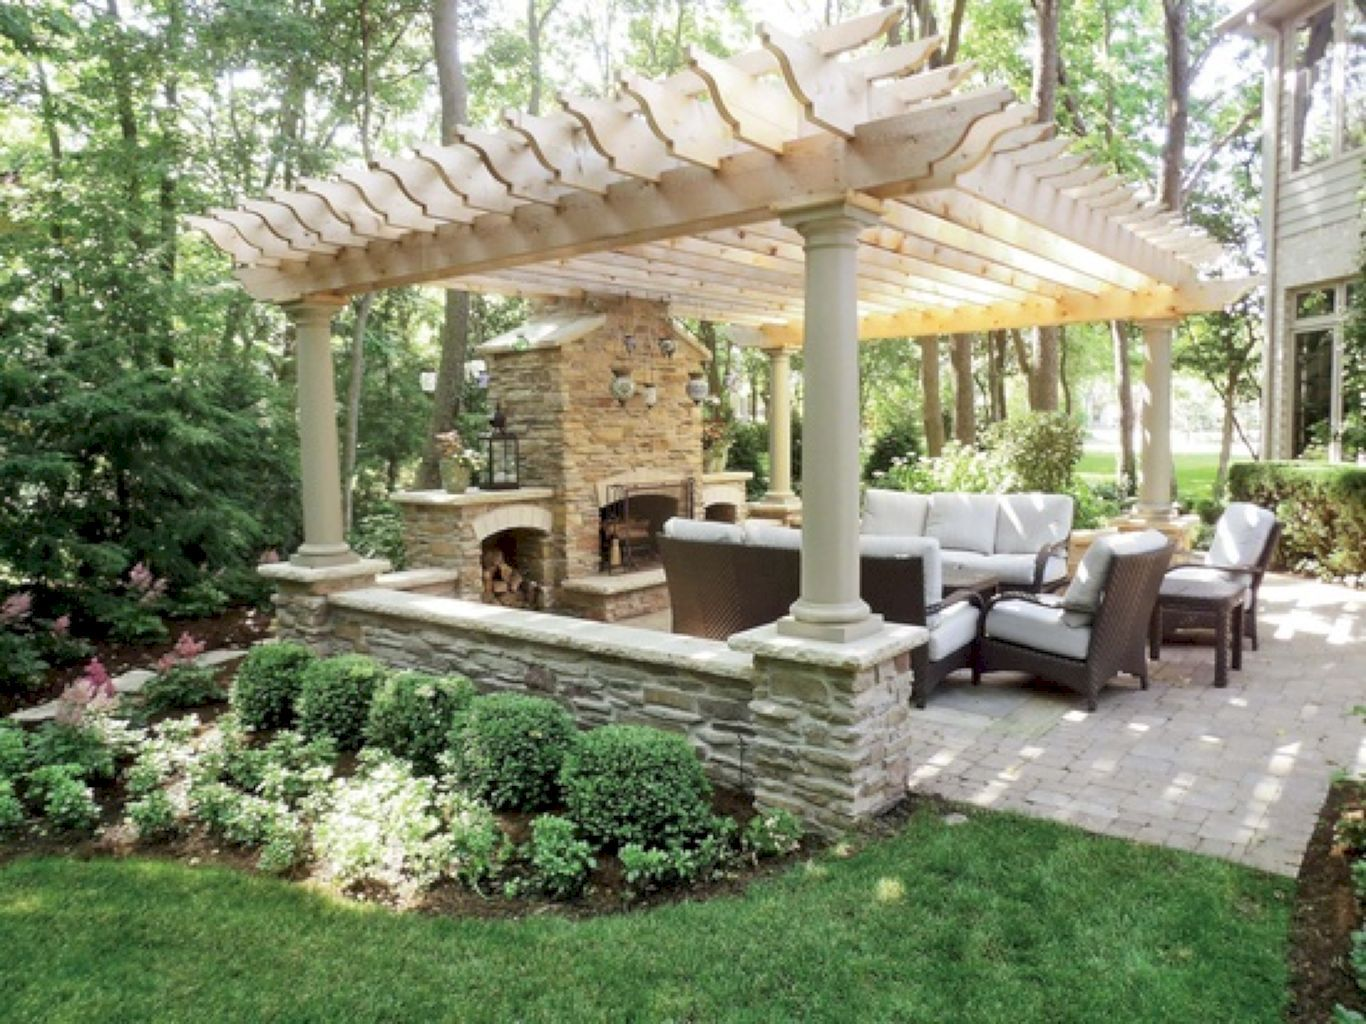 Awesome Backyard Ideas 27 awesome backyard pergola plan ideas   backyard   pinterest